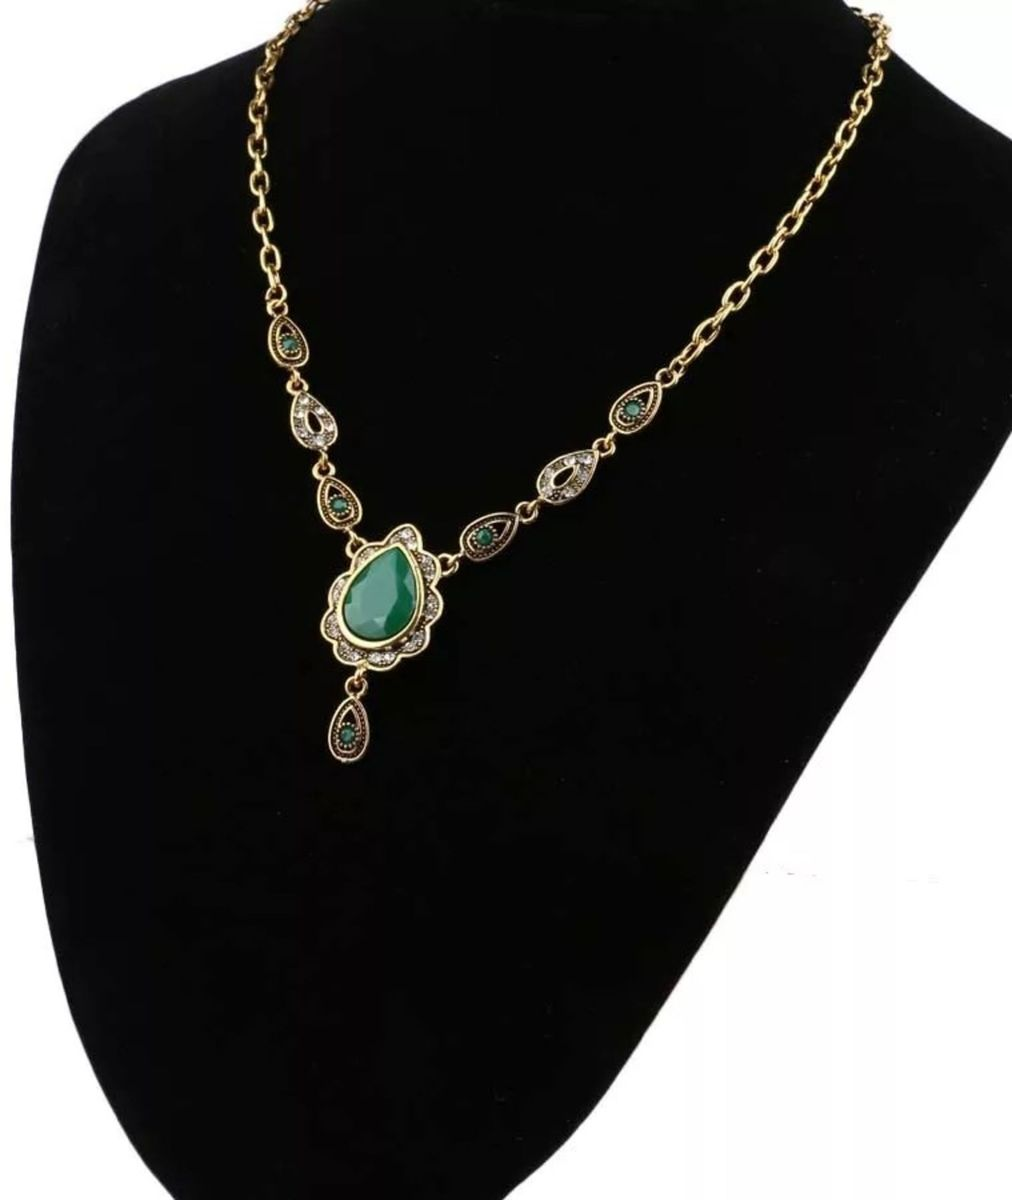 colar estilo indiano - bijoux sem-marca